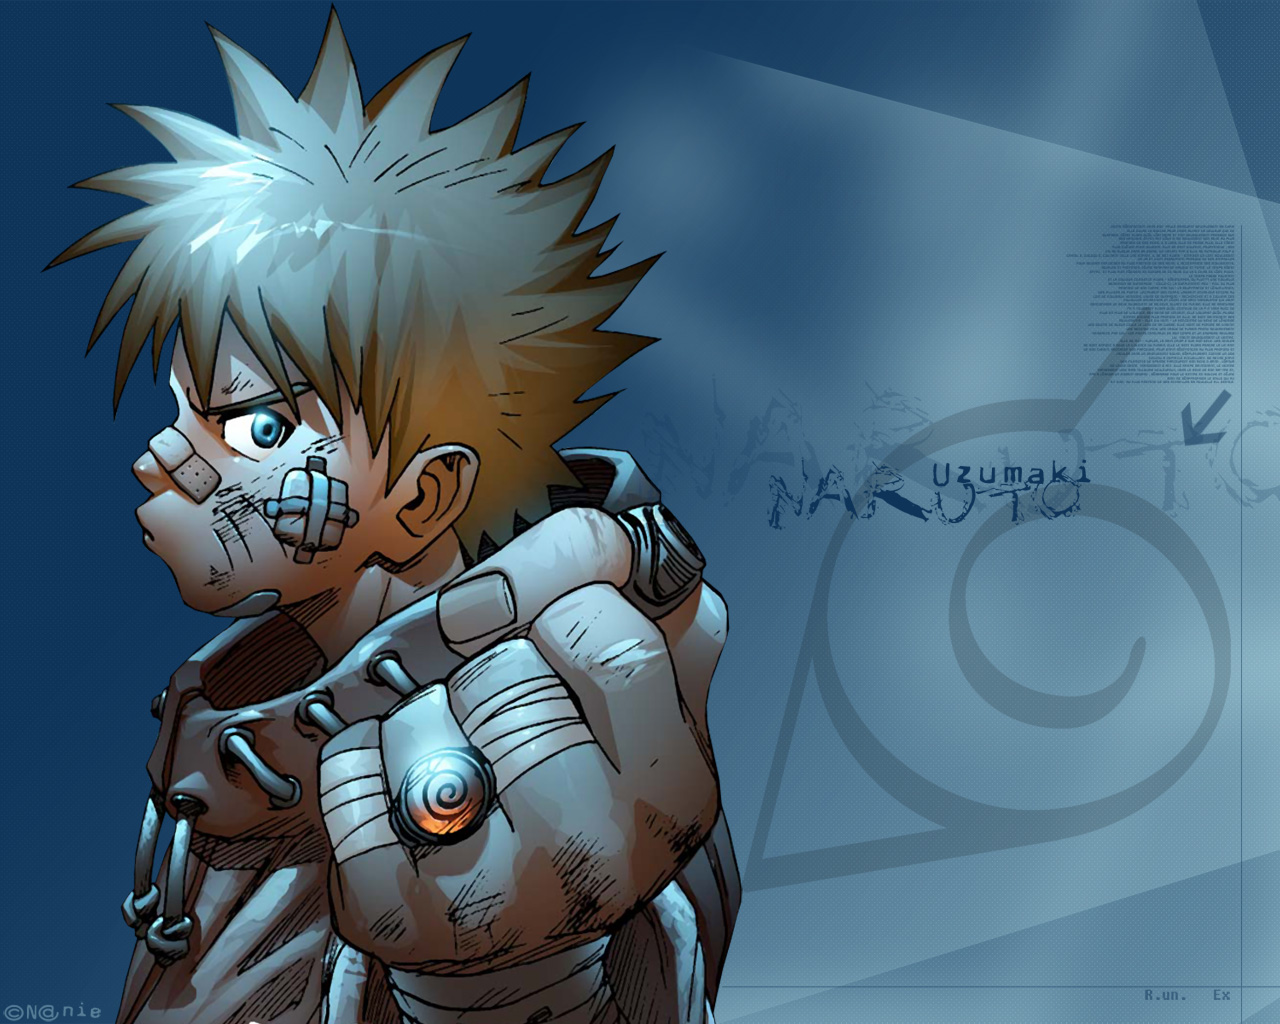 100 Lebih Wallpaper/Gambar Naruto